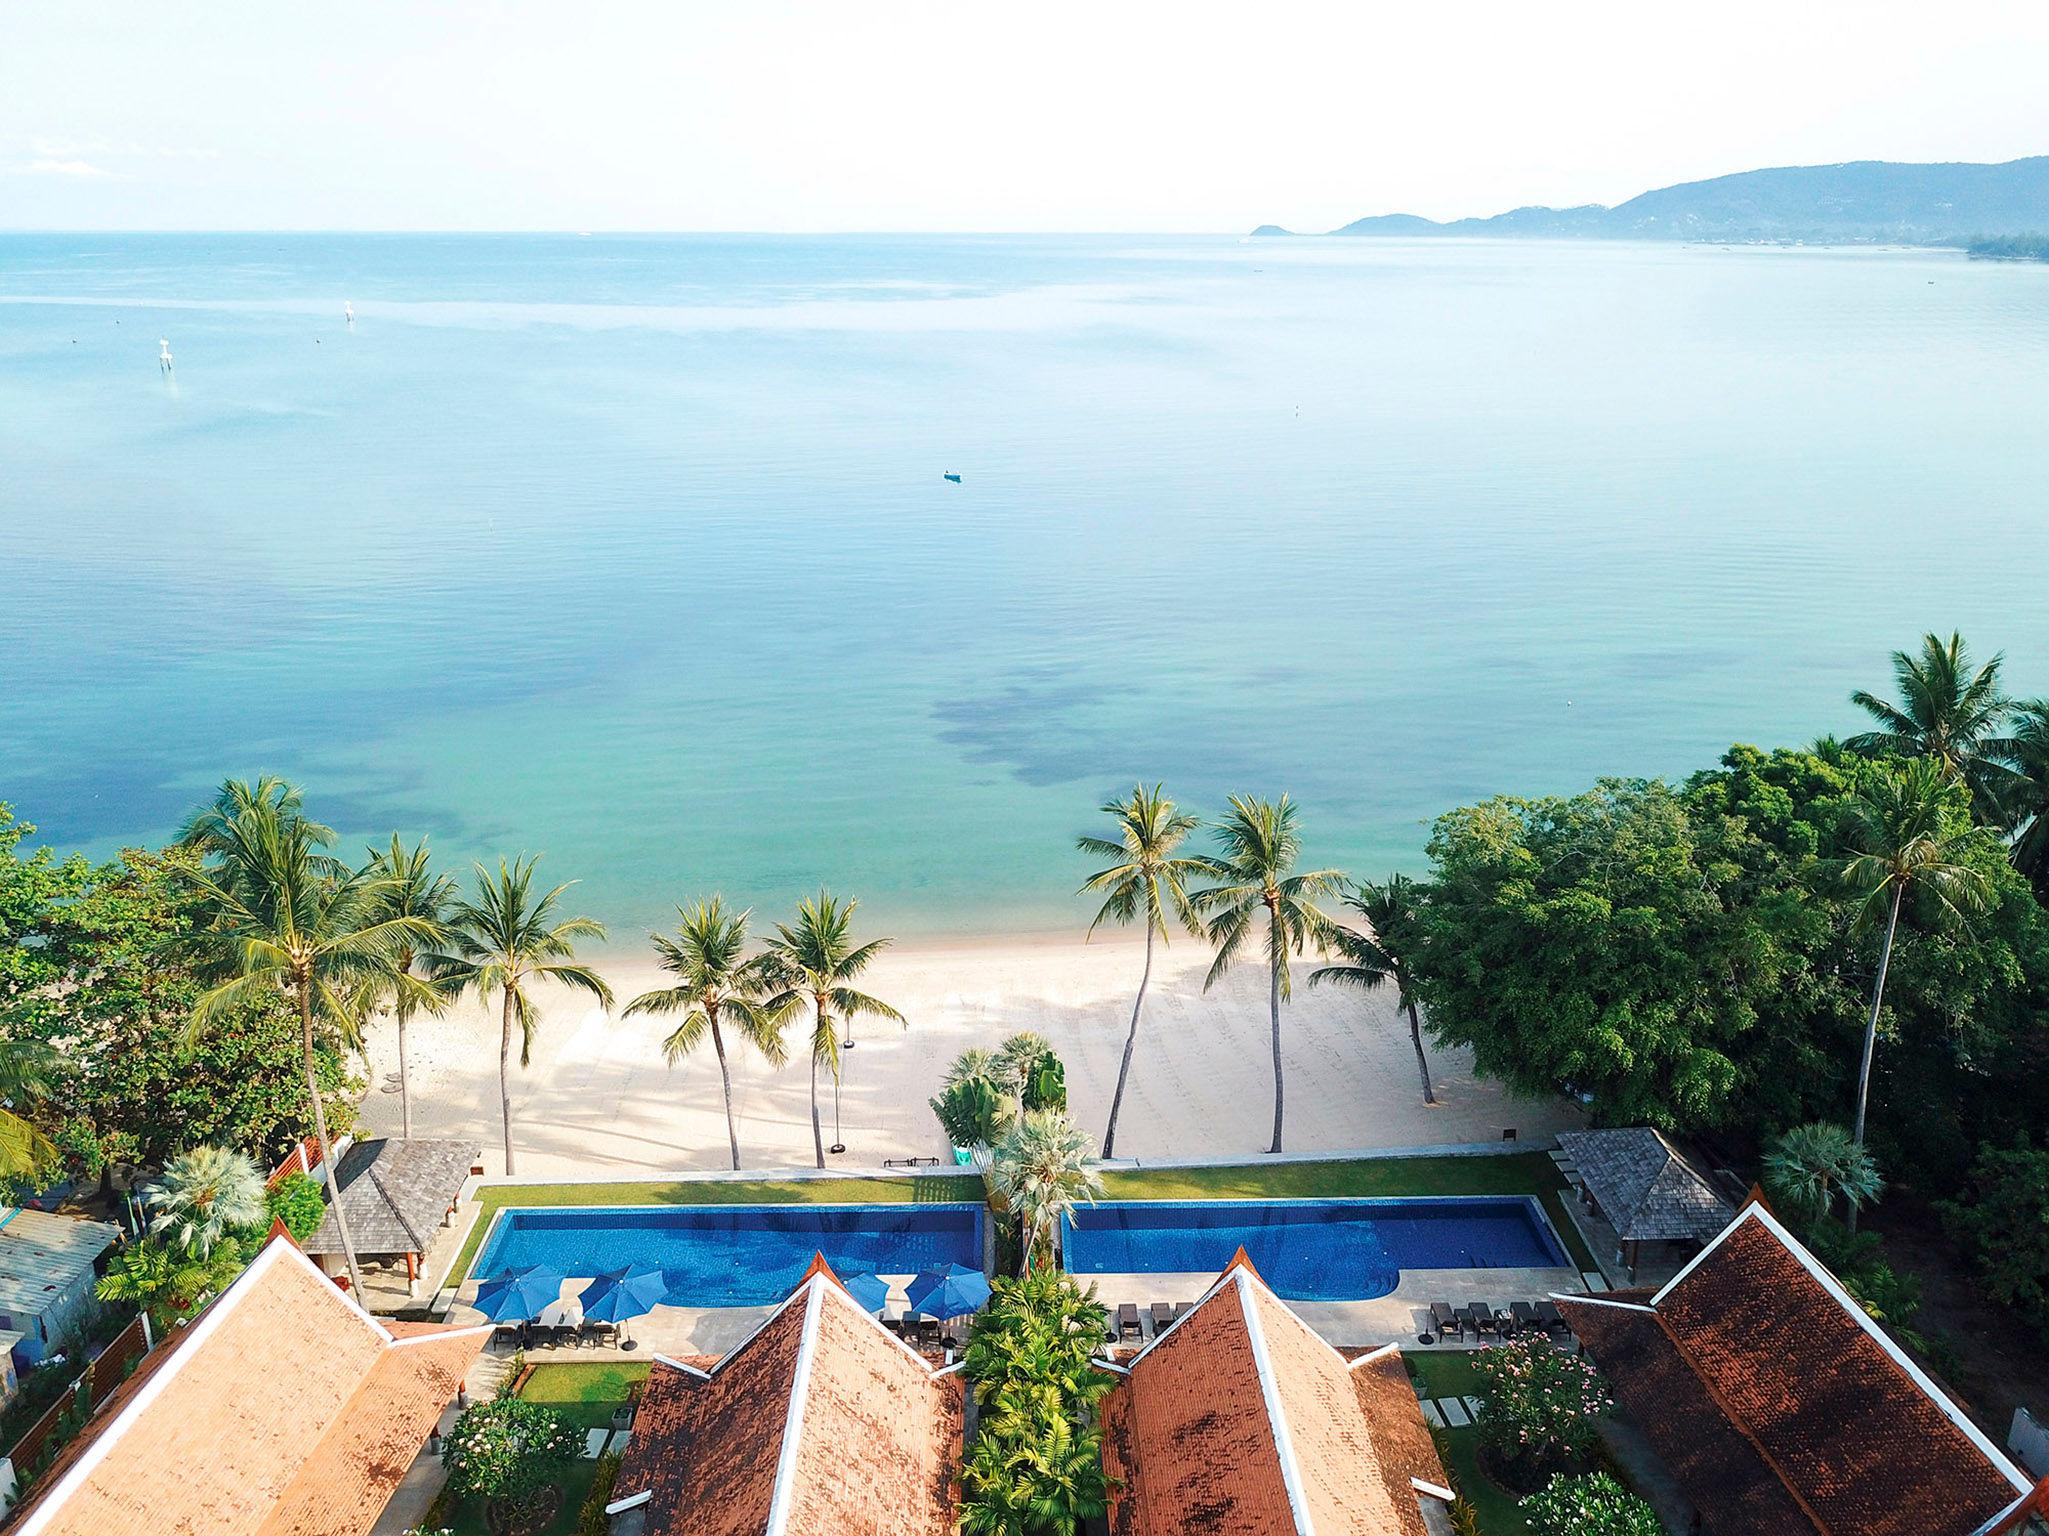 Tawantok Beach Villas - Villa 2 - Absolute beachfront villa